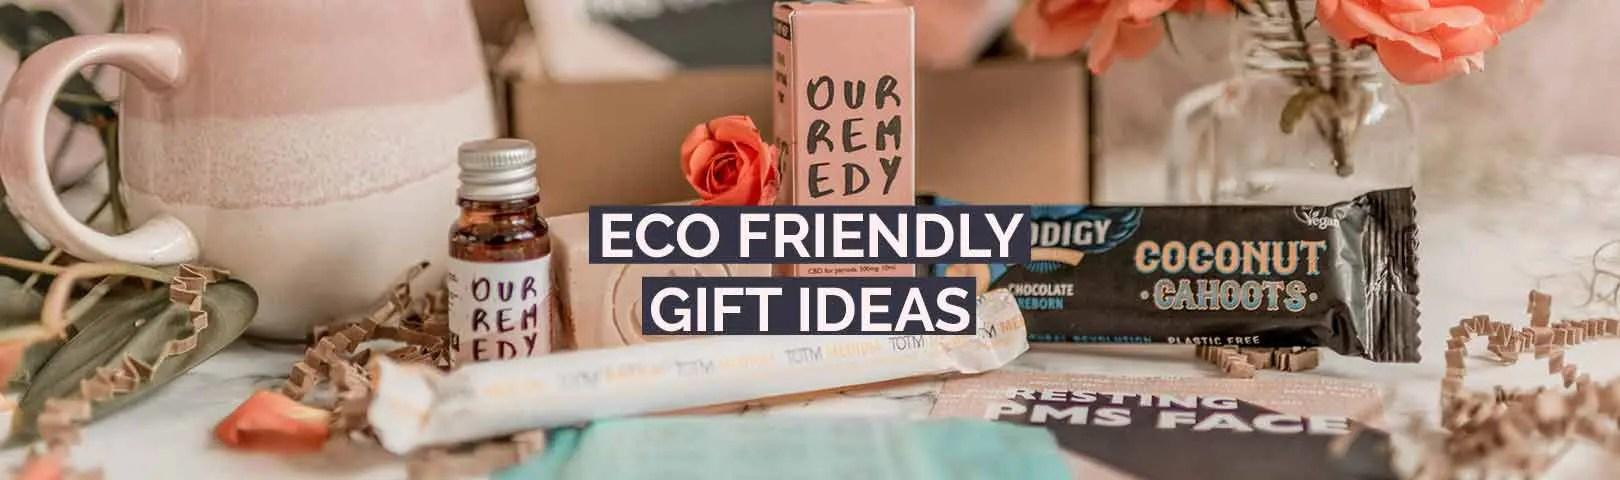 eco friendly gift ideas for xmas